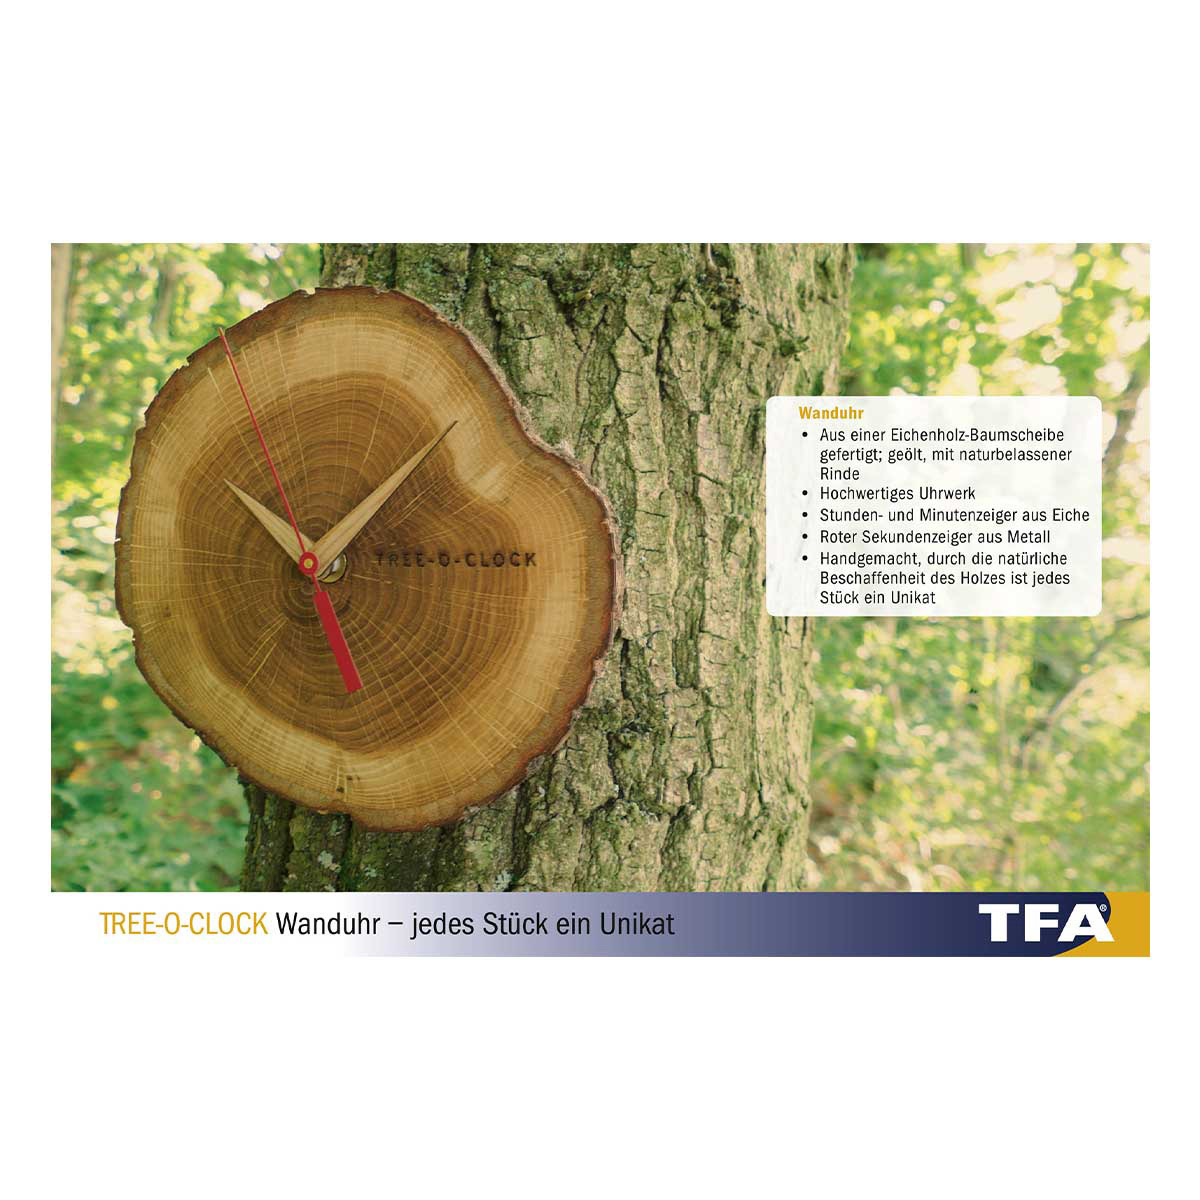 60-3046-08-analoge-wanduhr-eichenholz-tree-o-clock-vorteile-1200x1200px.jpg